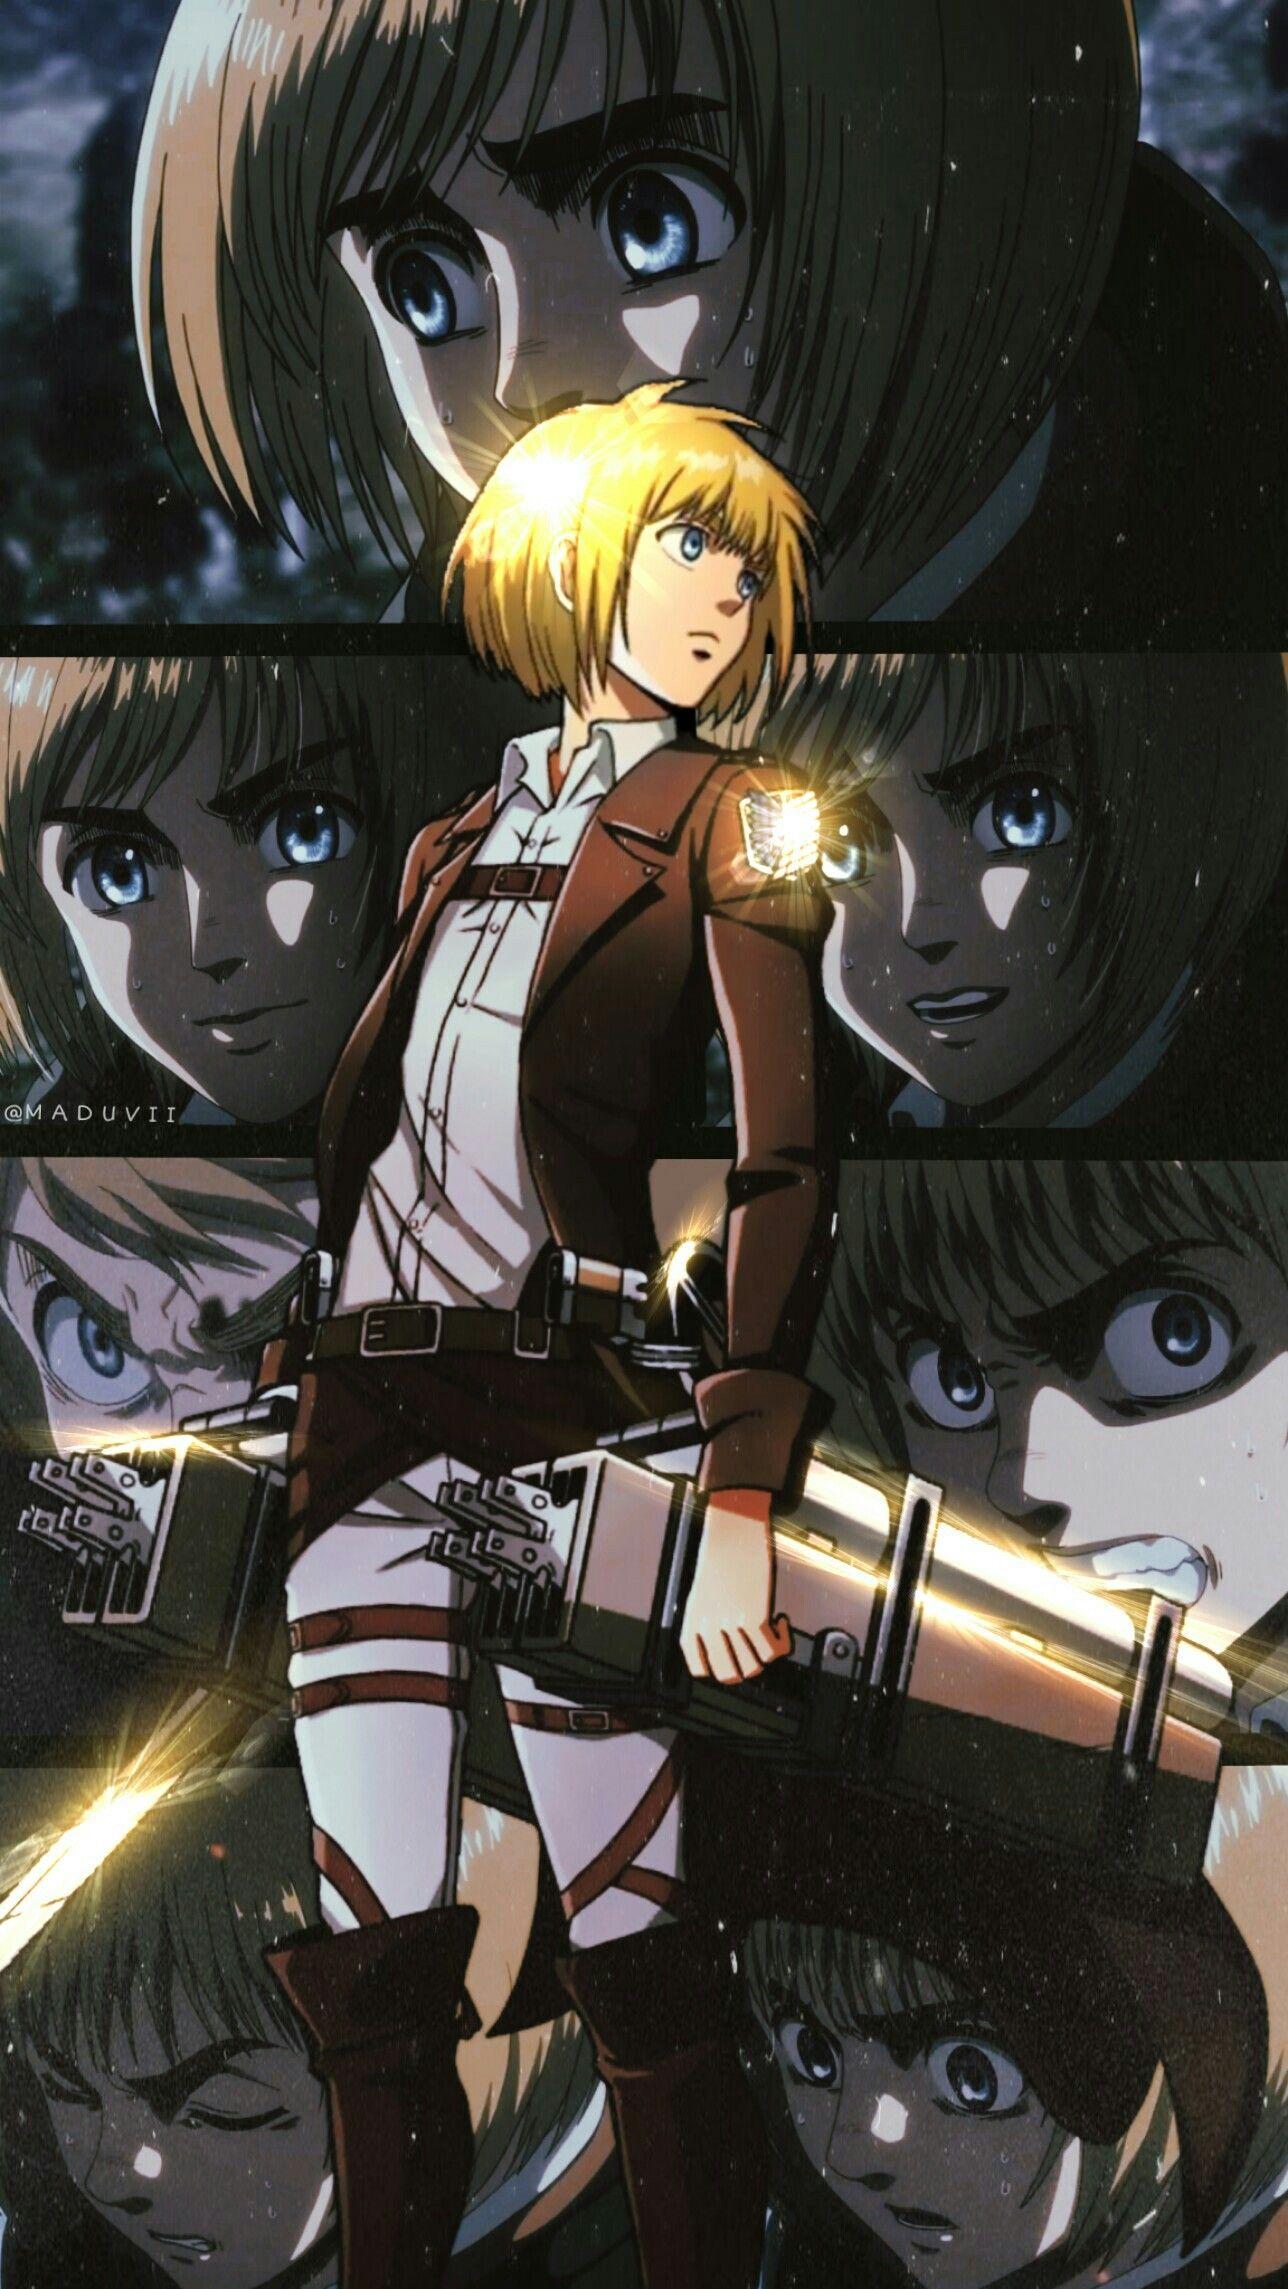 Armin Attackontitan Season3 Attack On Titan Anime Anime Attack On Titan Jean